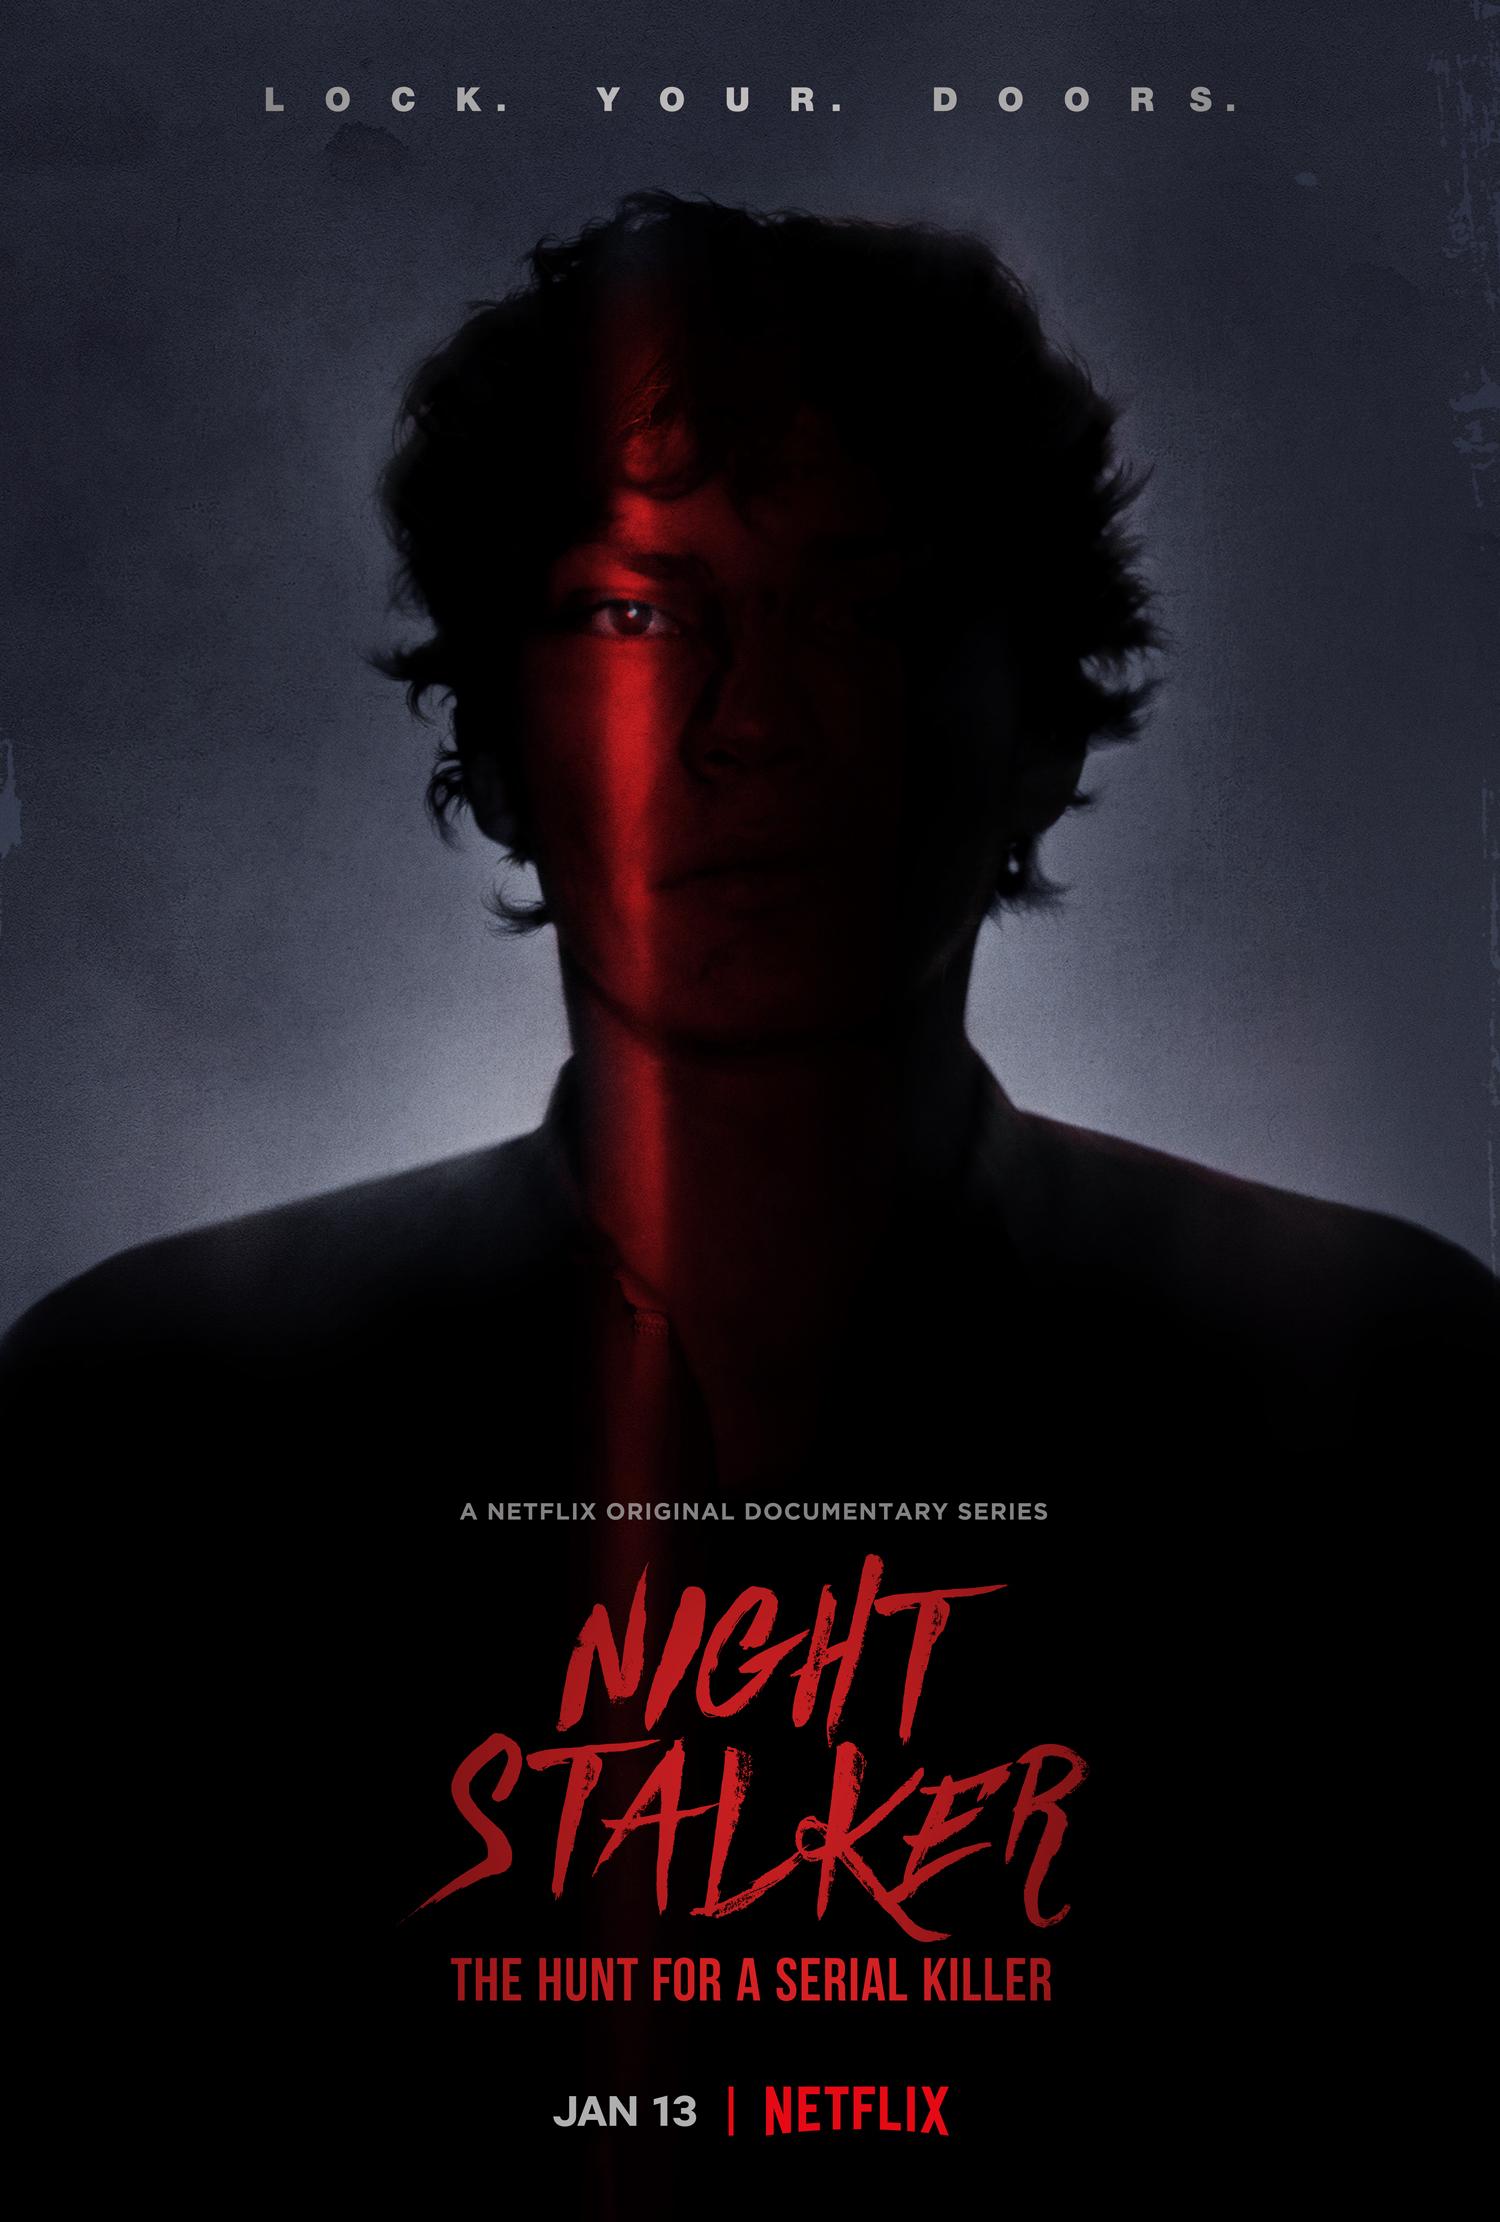 Night Stalker: The Hunt for a Serial Killer (TV Mini-Series 2021) - IMDb